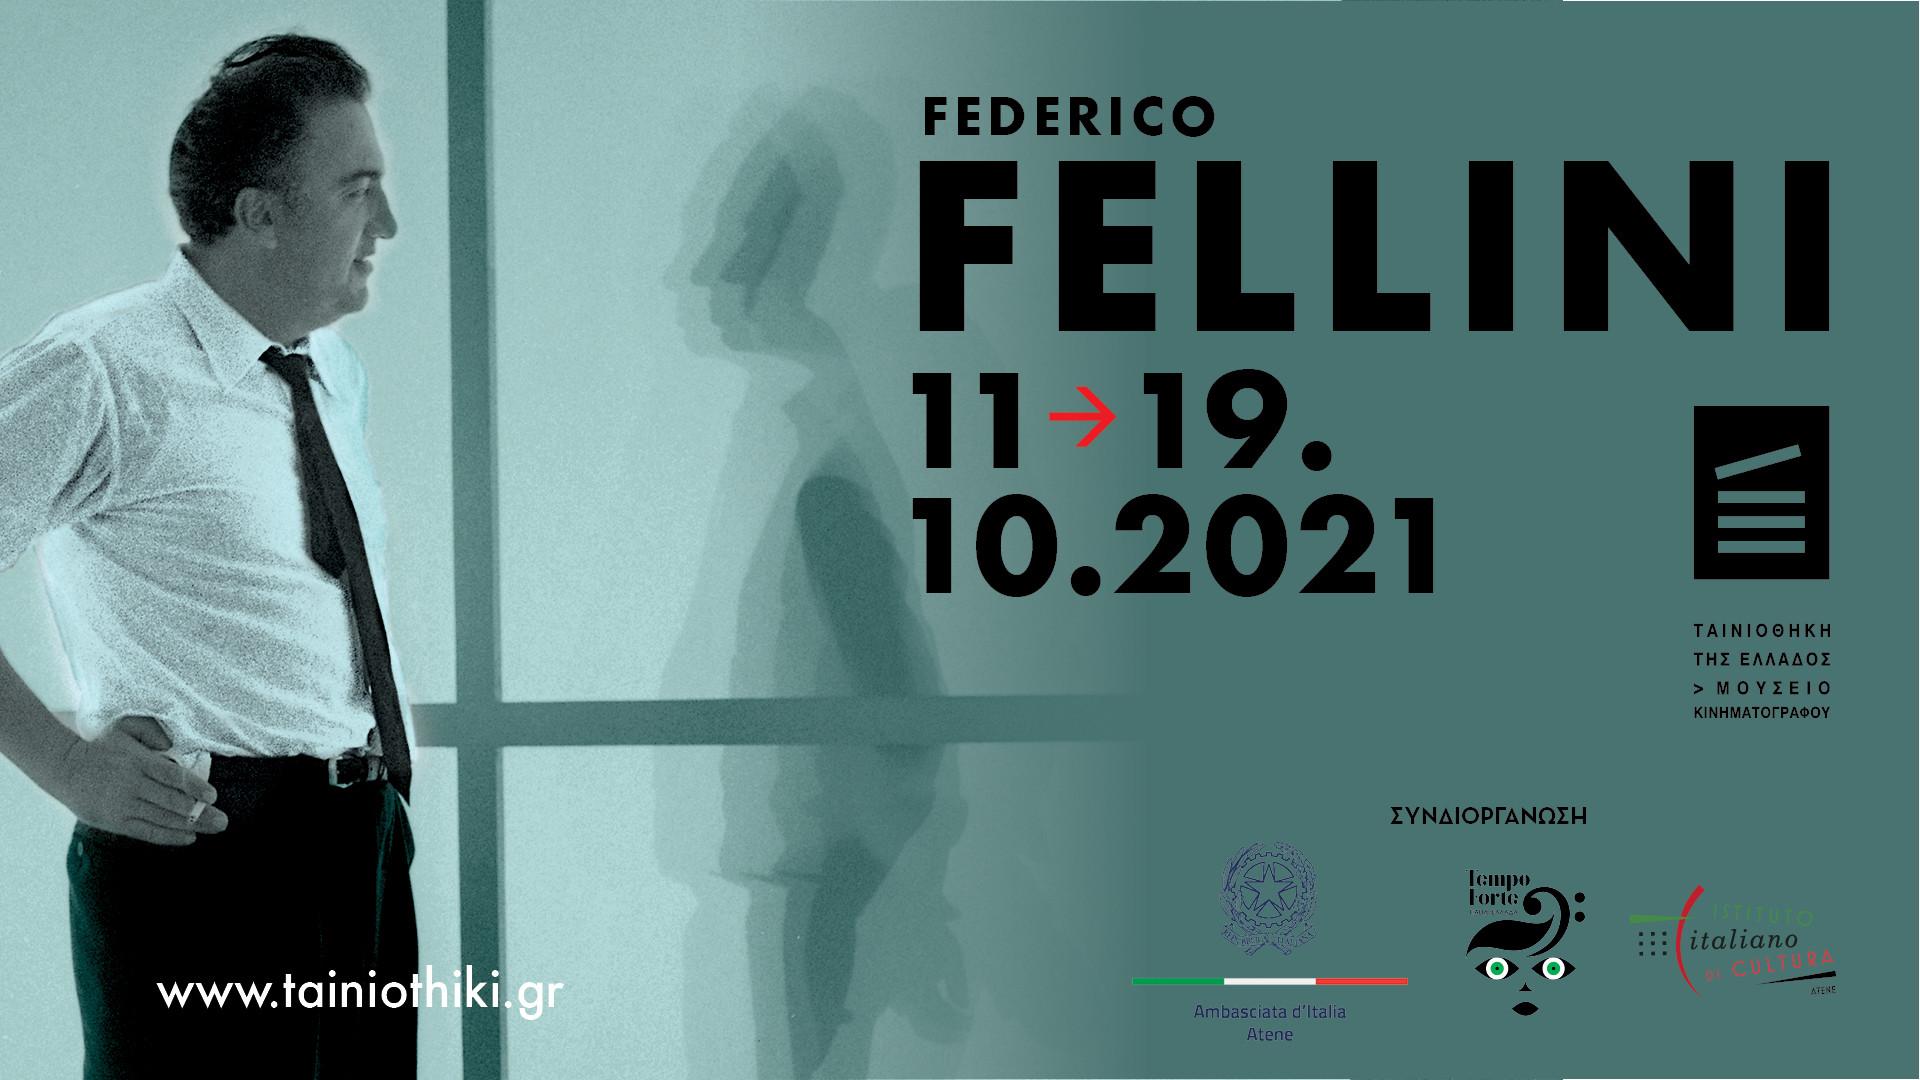 Federico Fellini tribute